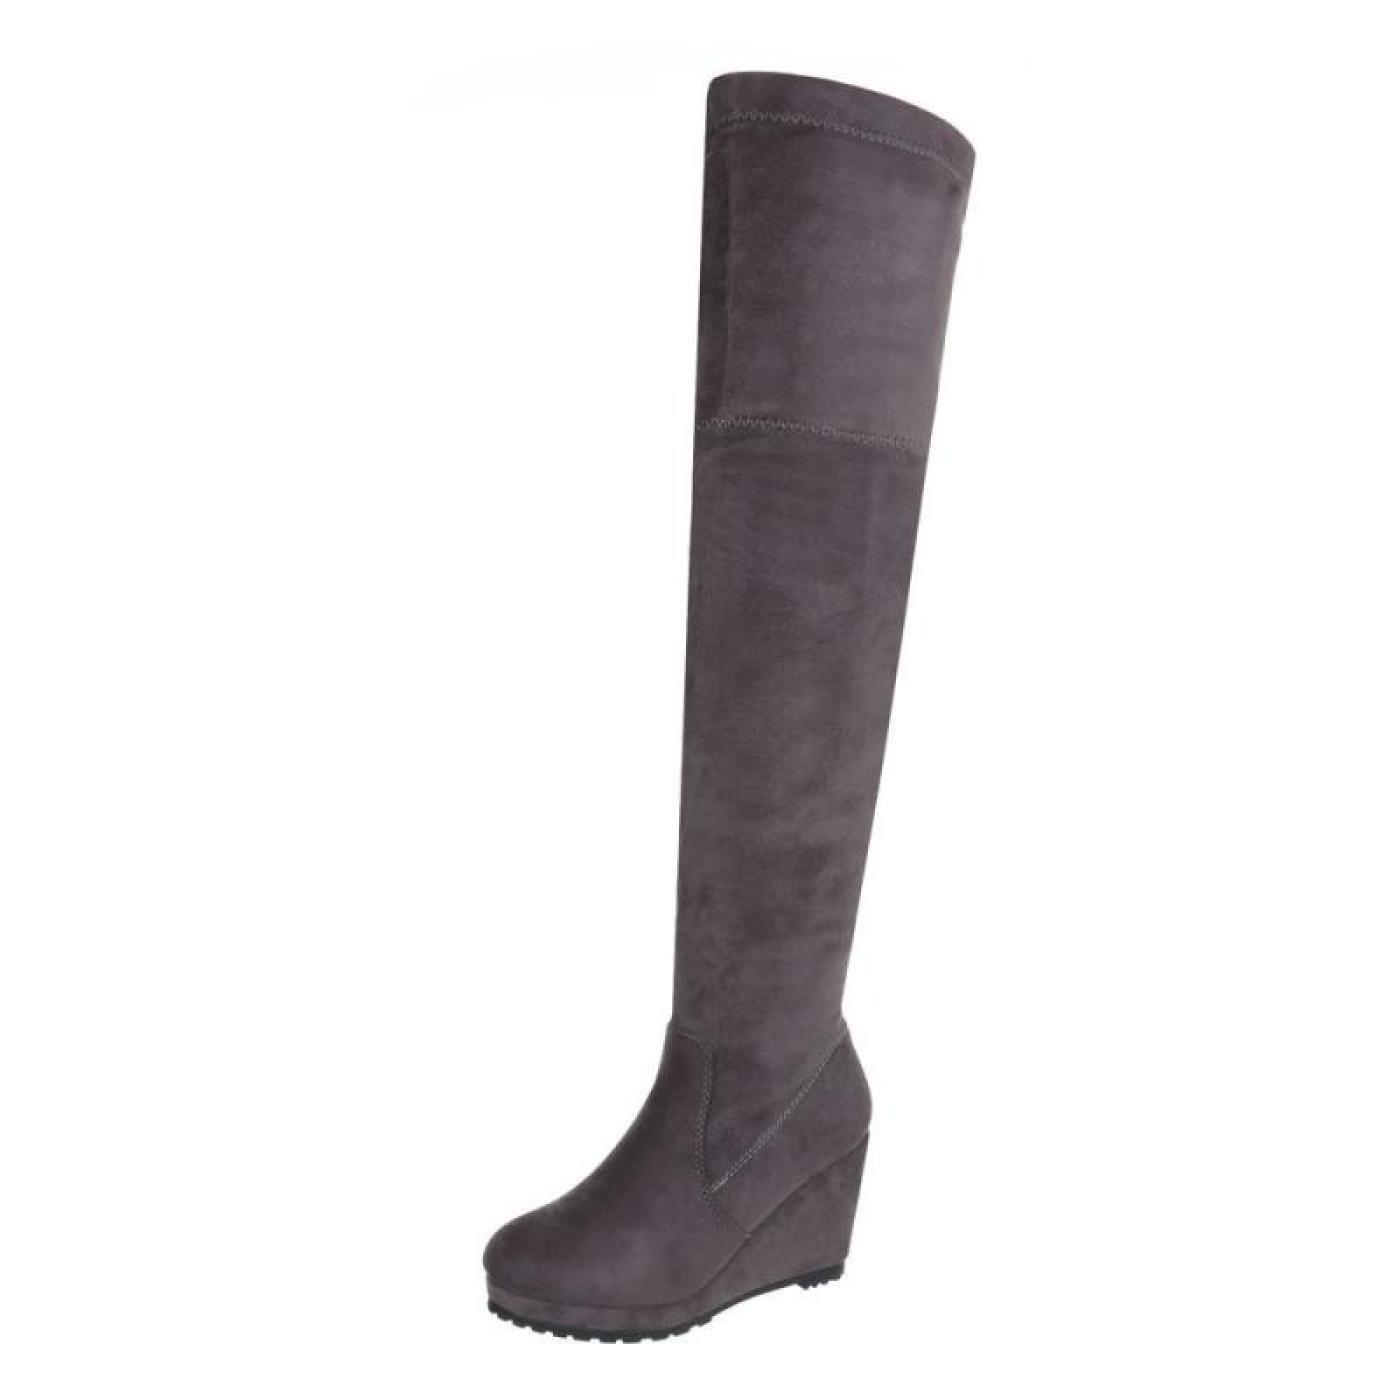 Cingant Woman Overknee Damen Overknee Woman Stiefel/Leichte Plateausohle/Damenschuh/Stiefel/Keilabsatz/Grau - 7ed86a